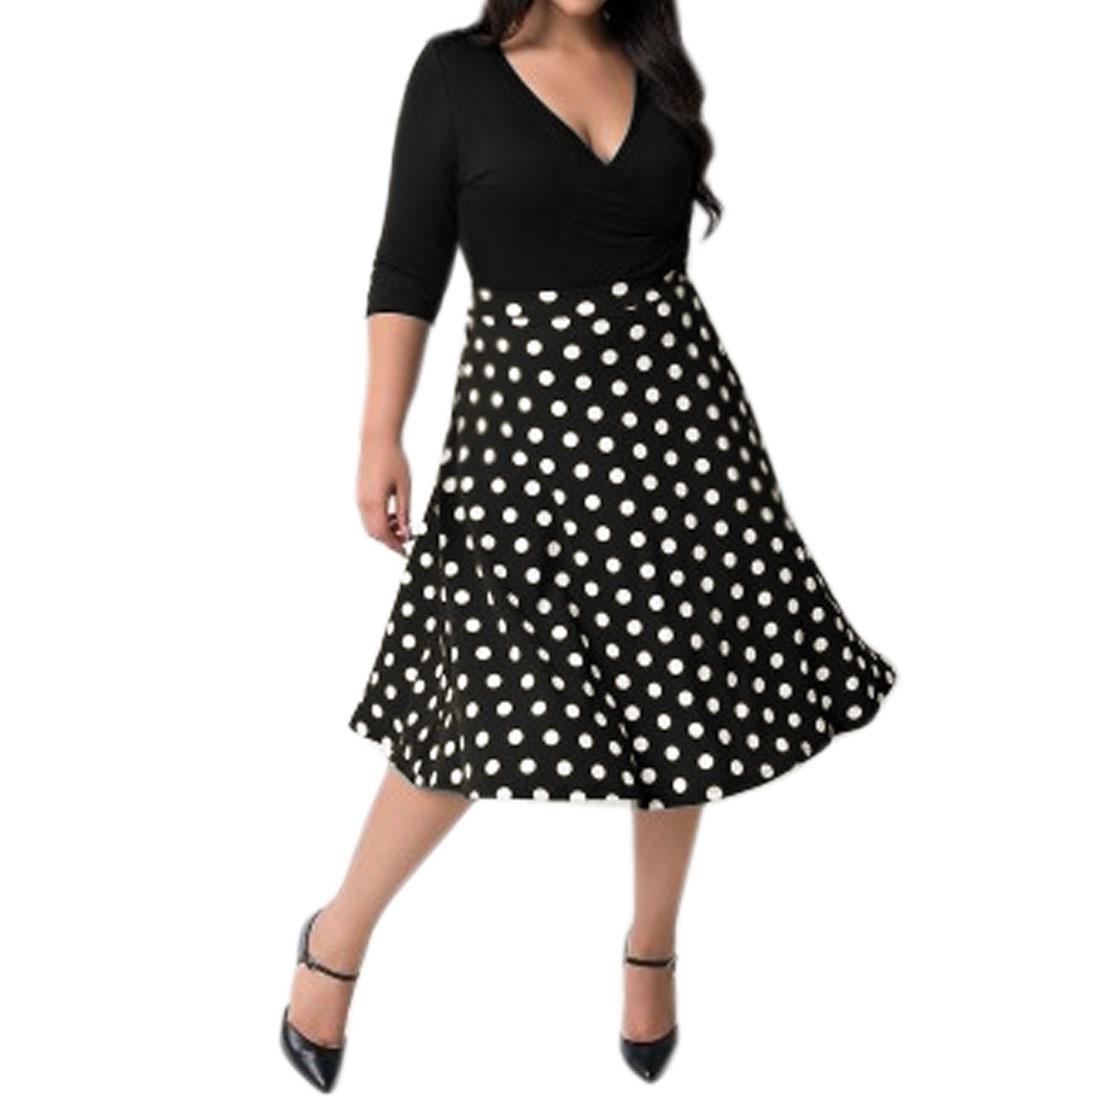 Lady Crossover V Neck 3/4 Sleeves Dots Paneled A Line Dress Black XL